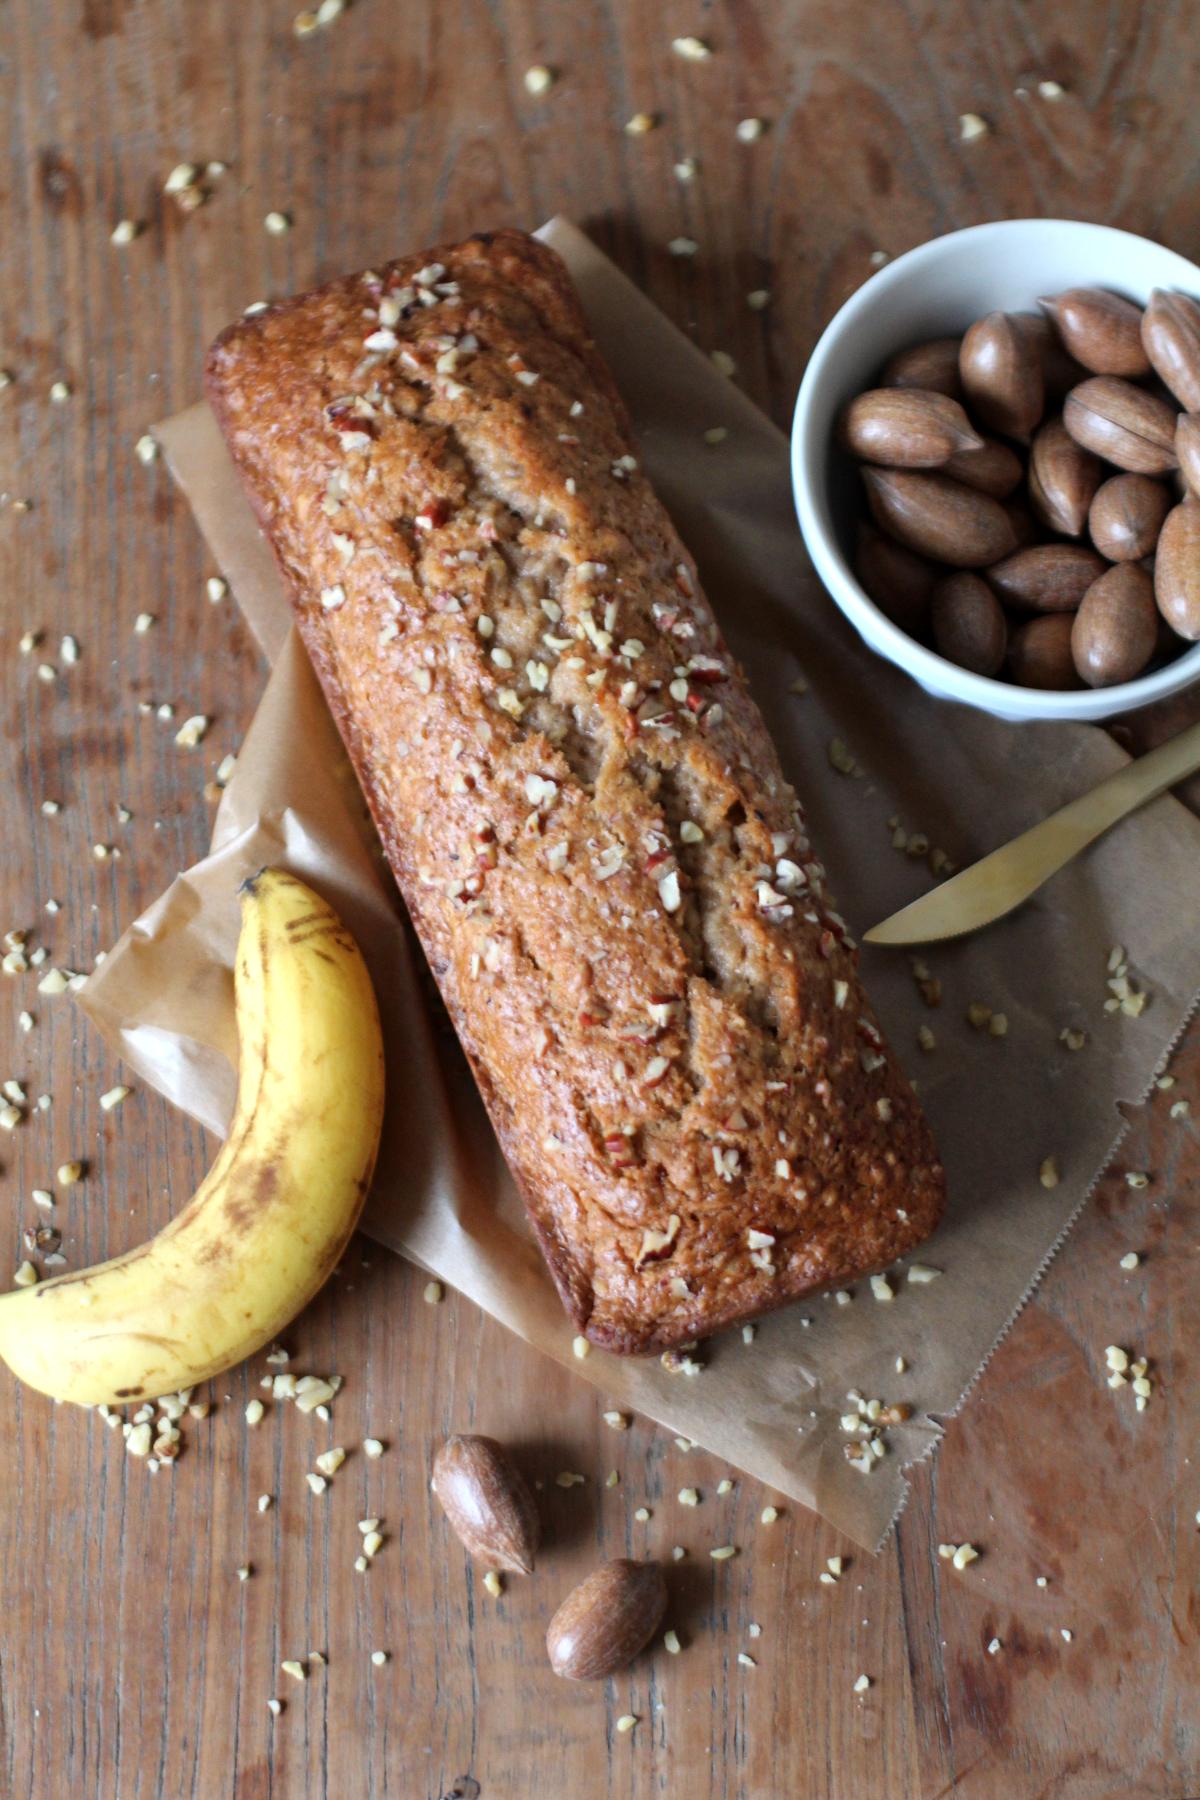 leonie-loewenherz-lena-rezepte-backen-bananenbrot